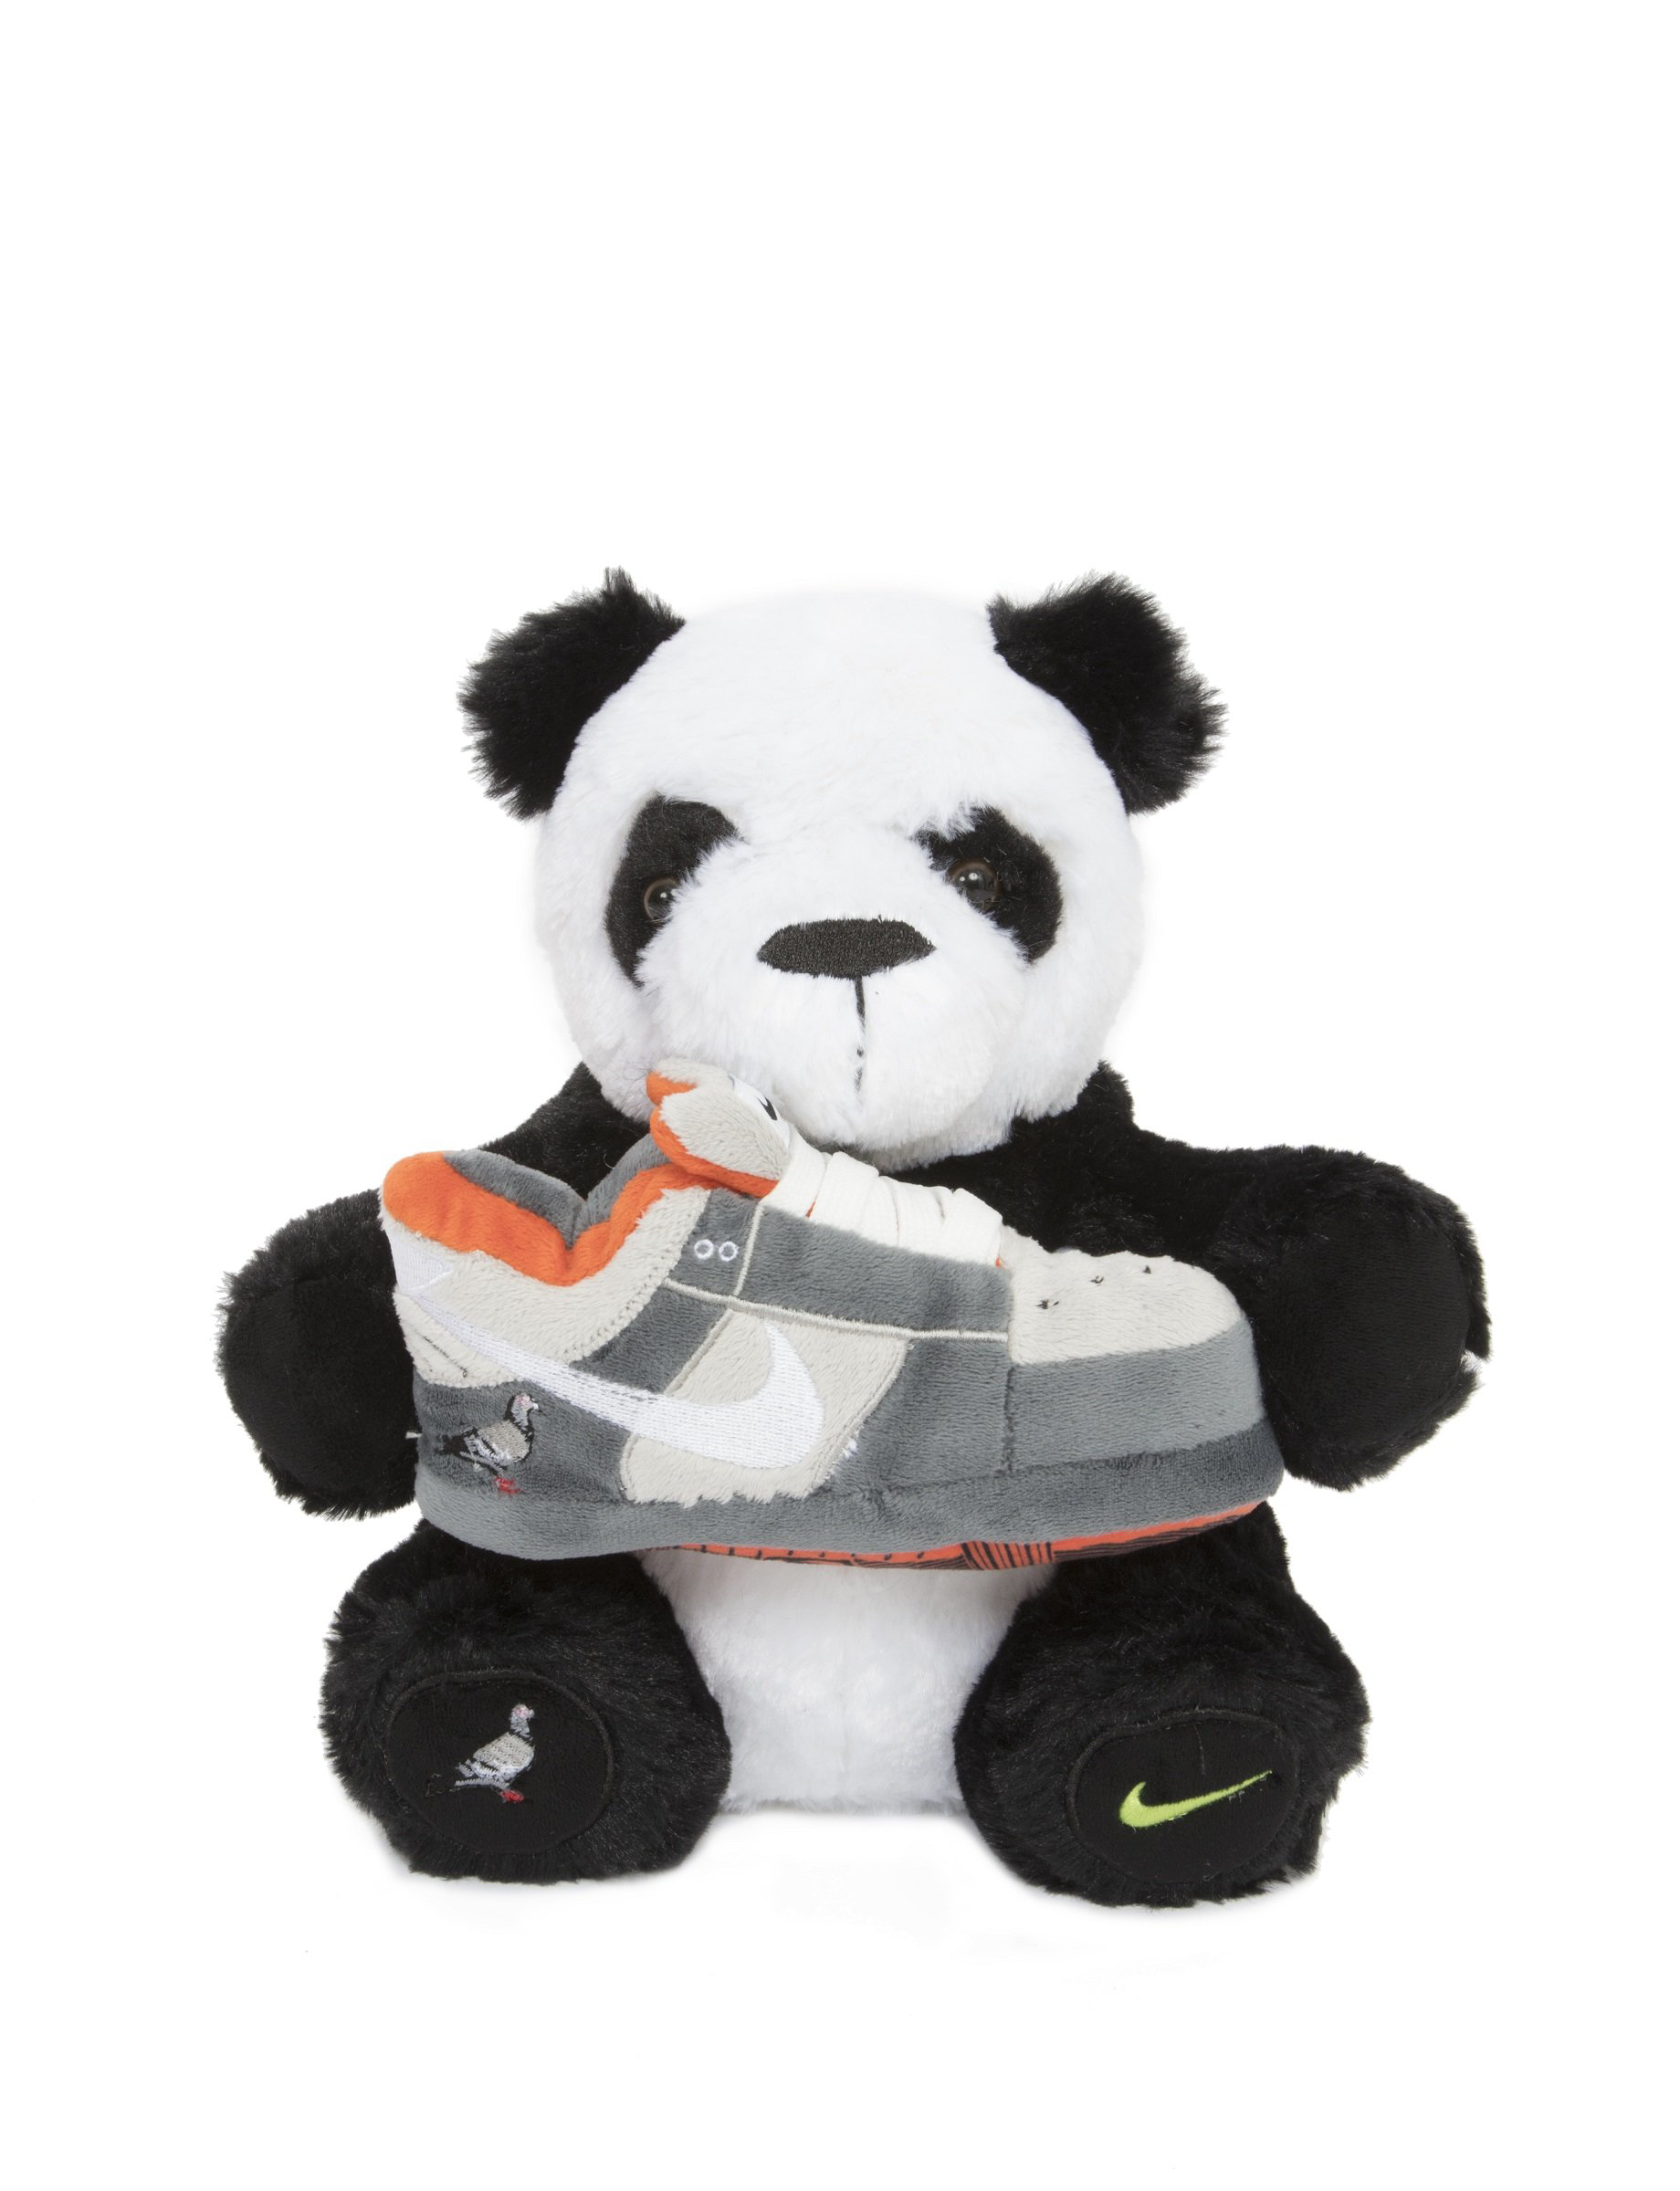 Nike x Staple Panda Pigeon Plush Black